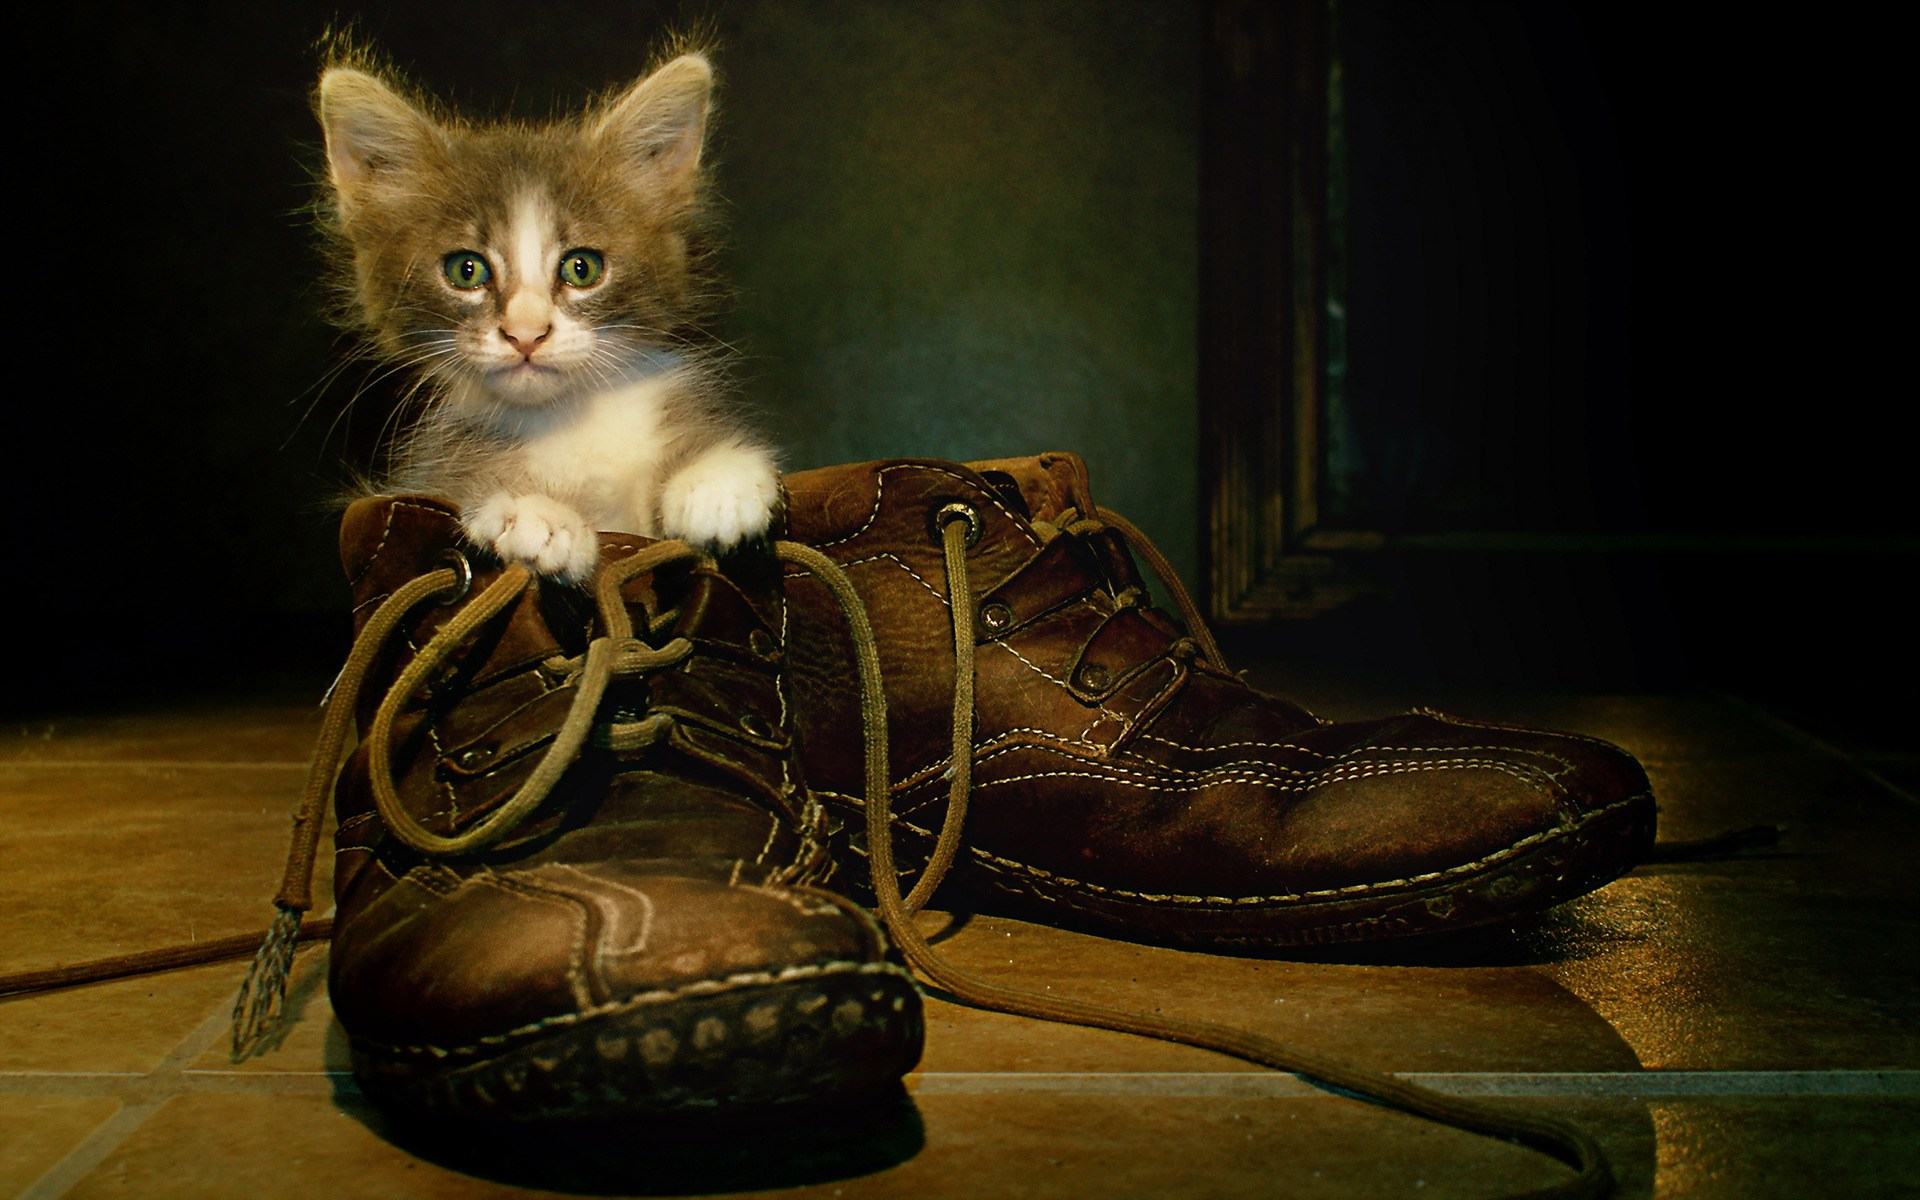 cute-cat-in-big-shoes-hd-wallpaper